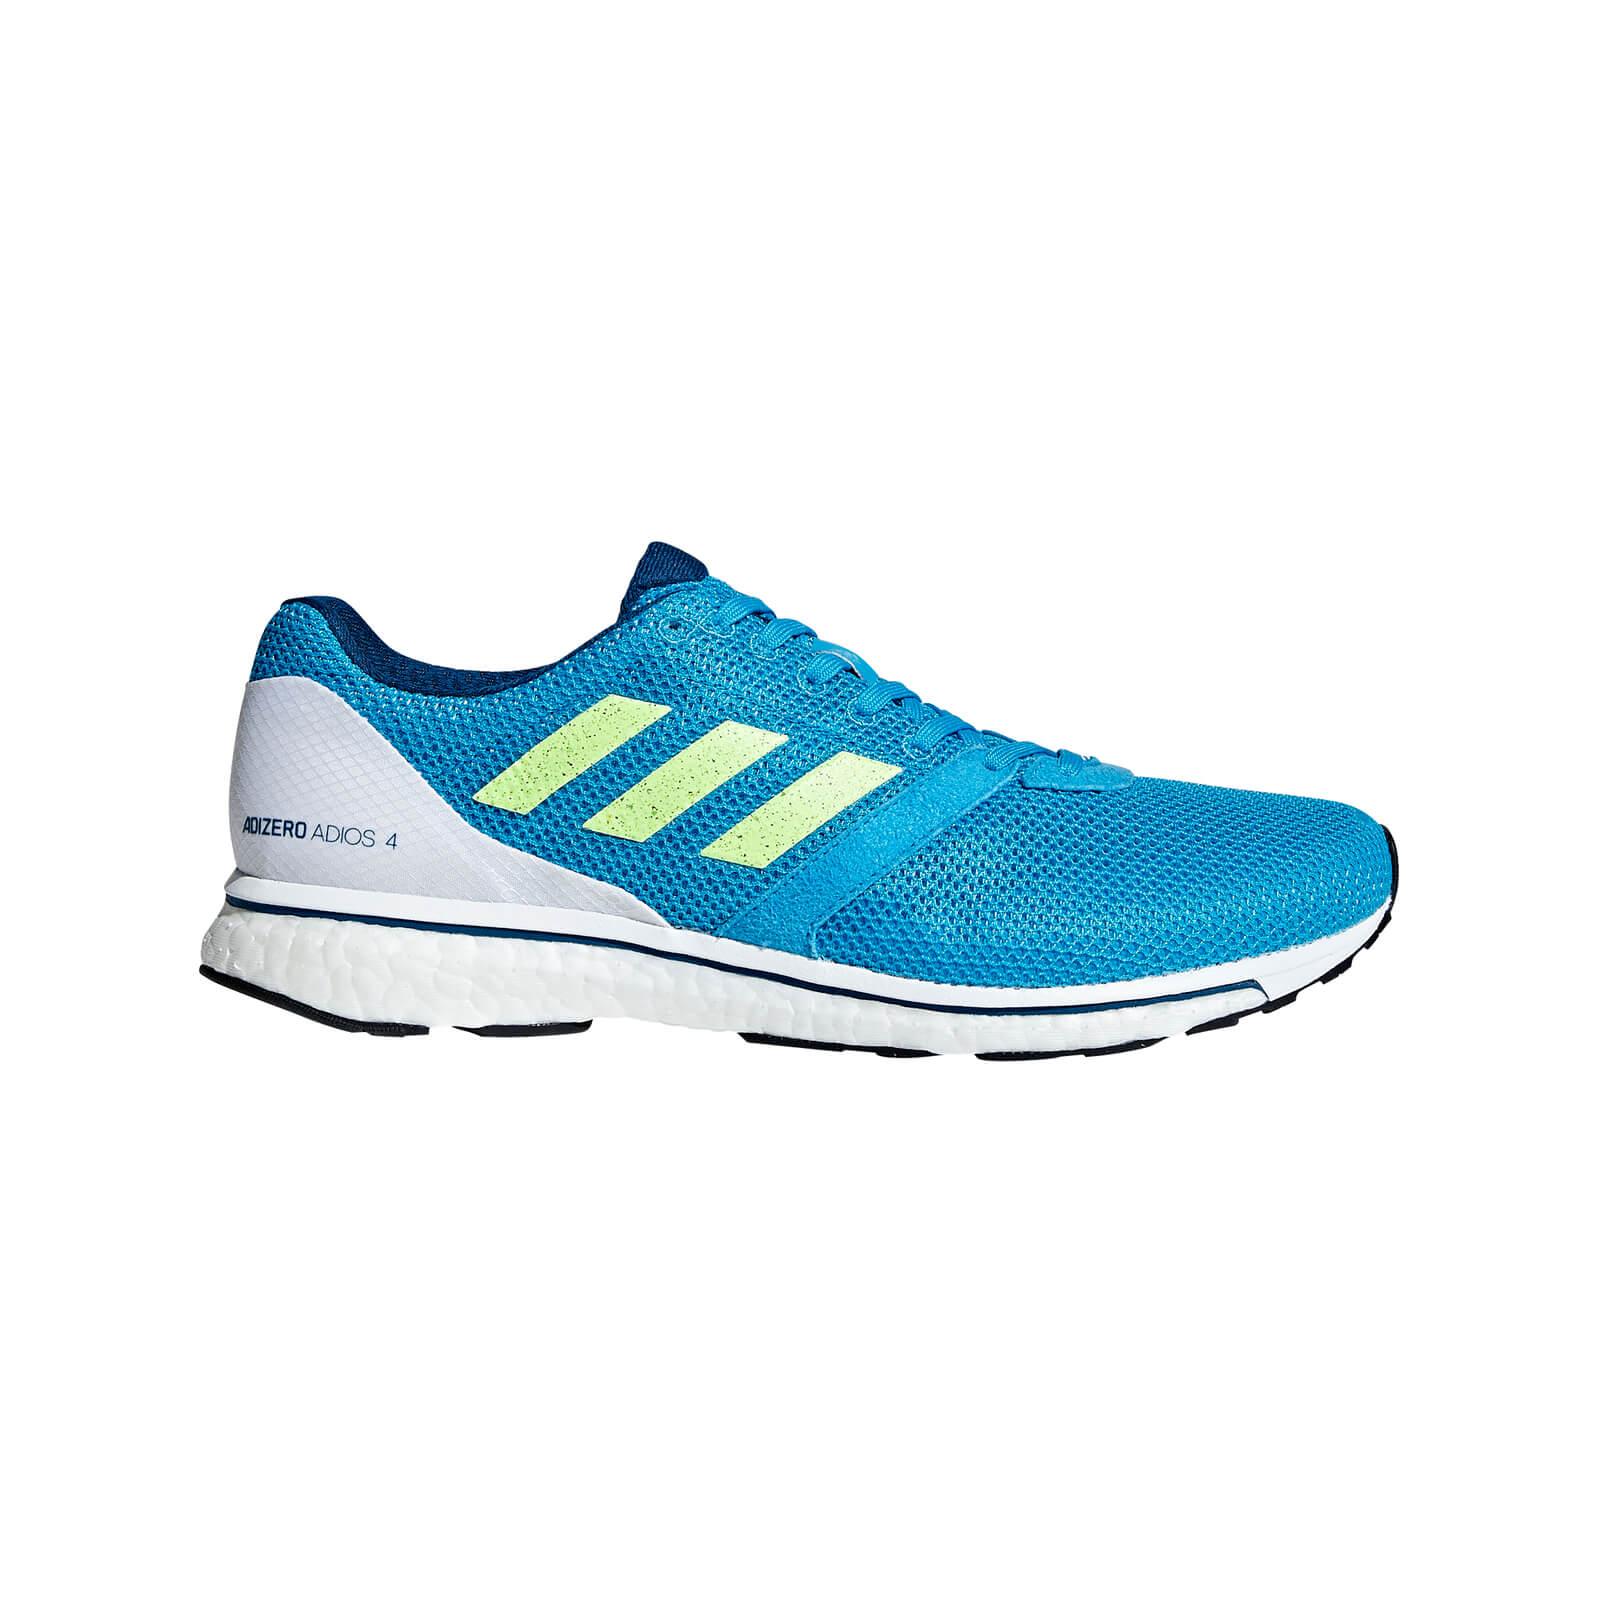 adidas Men's Adizero Adios 4 Running Shoes - Blue - US 11/UK 10.5 - Blue